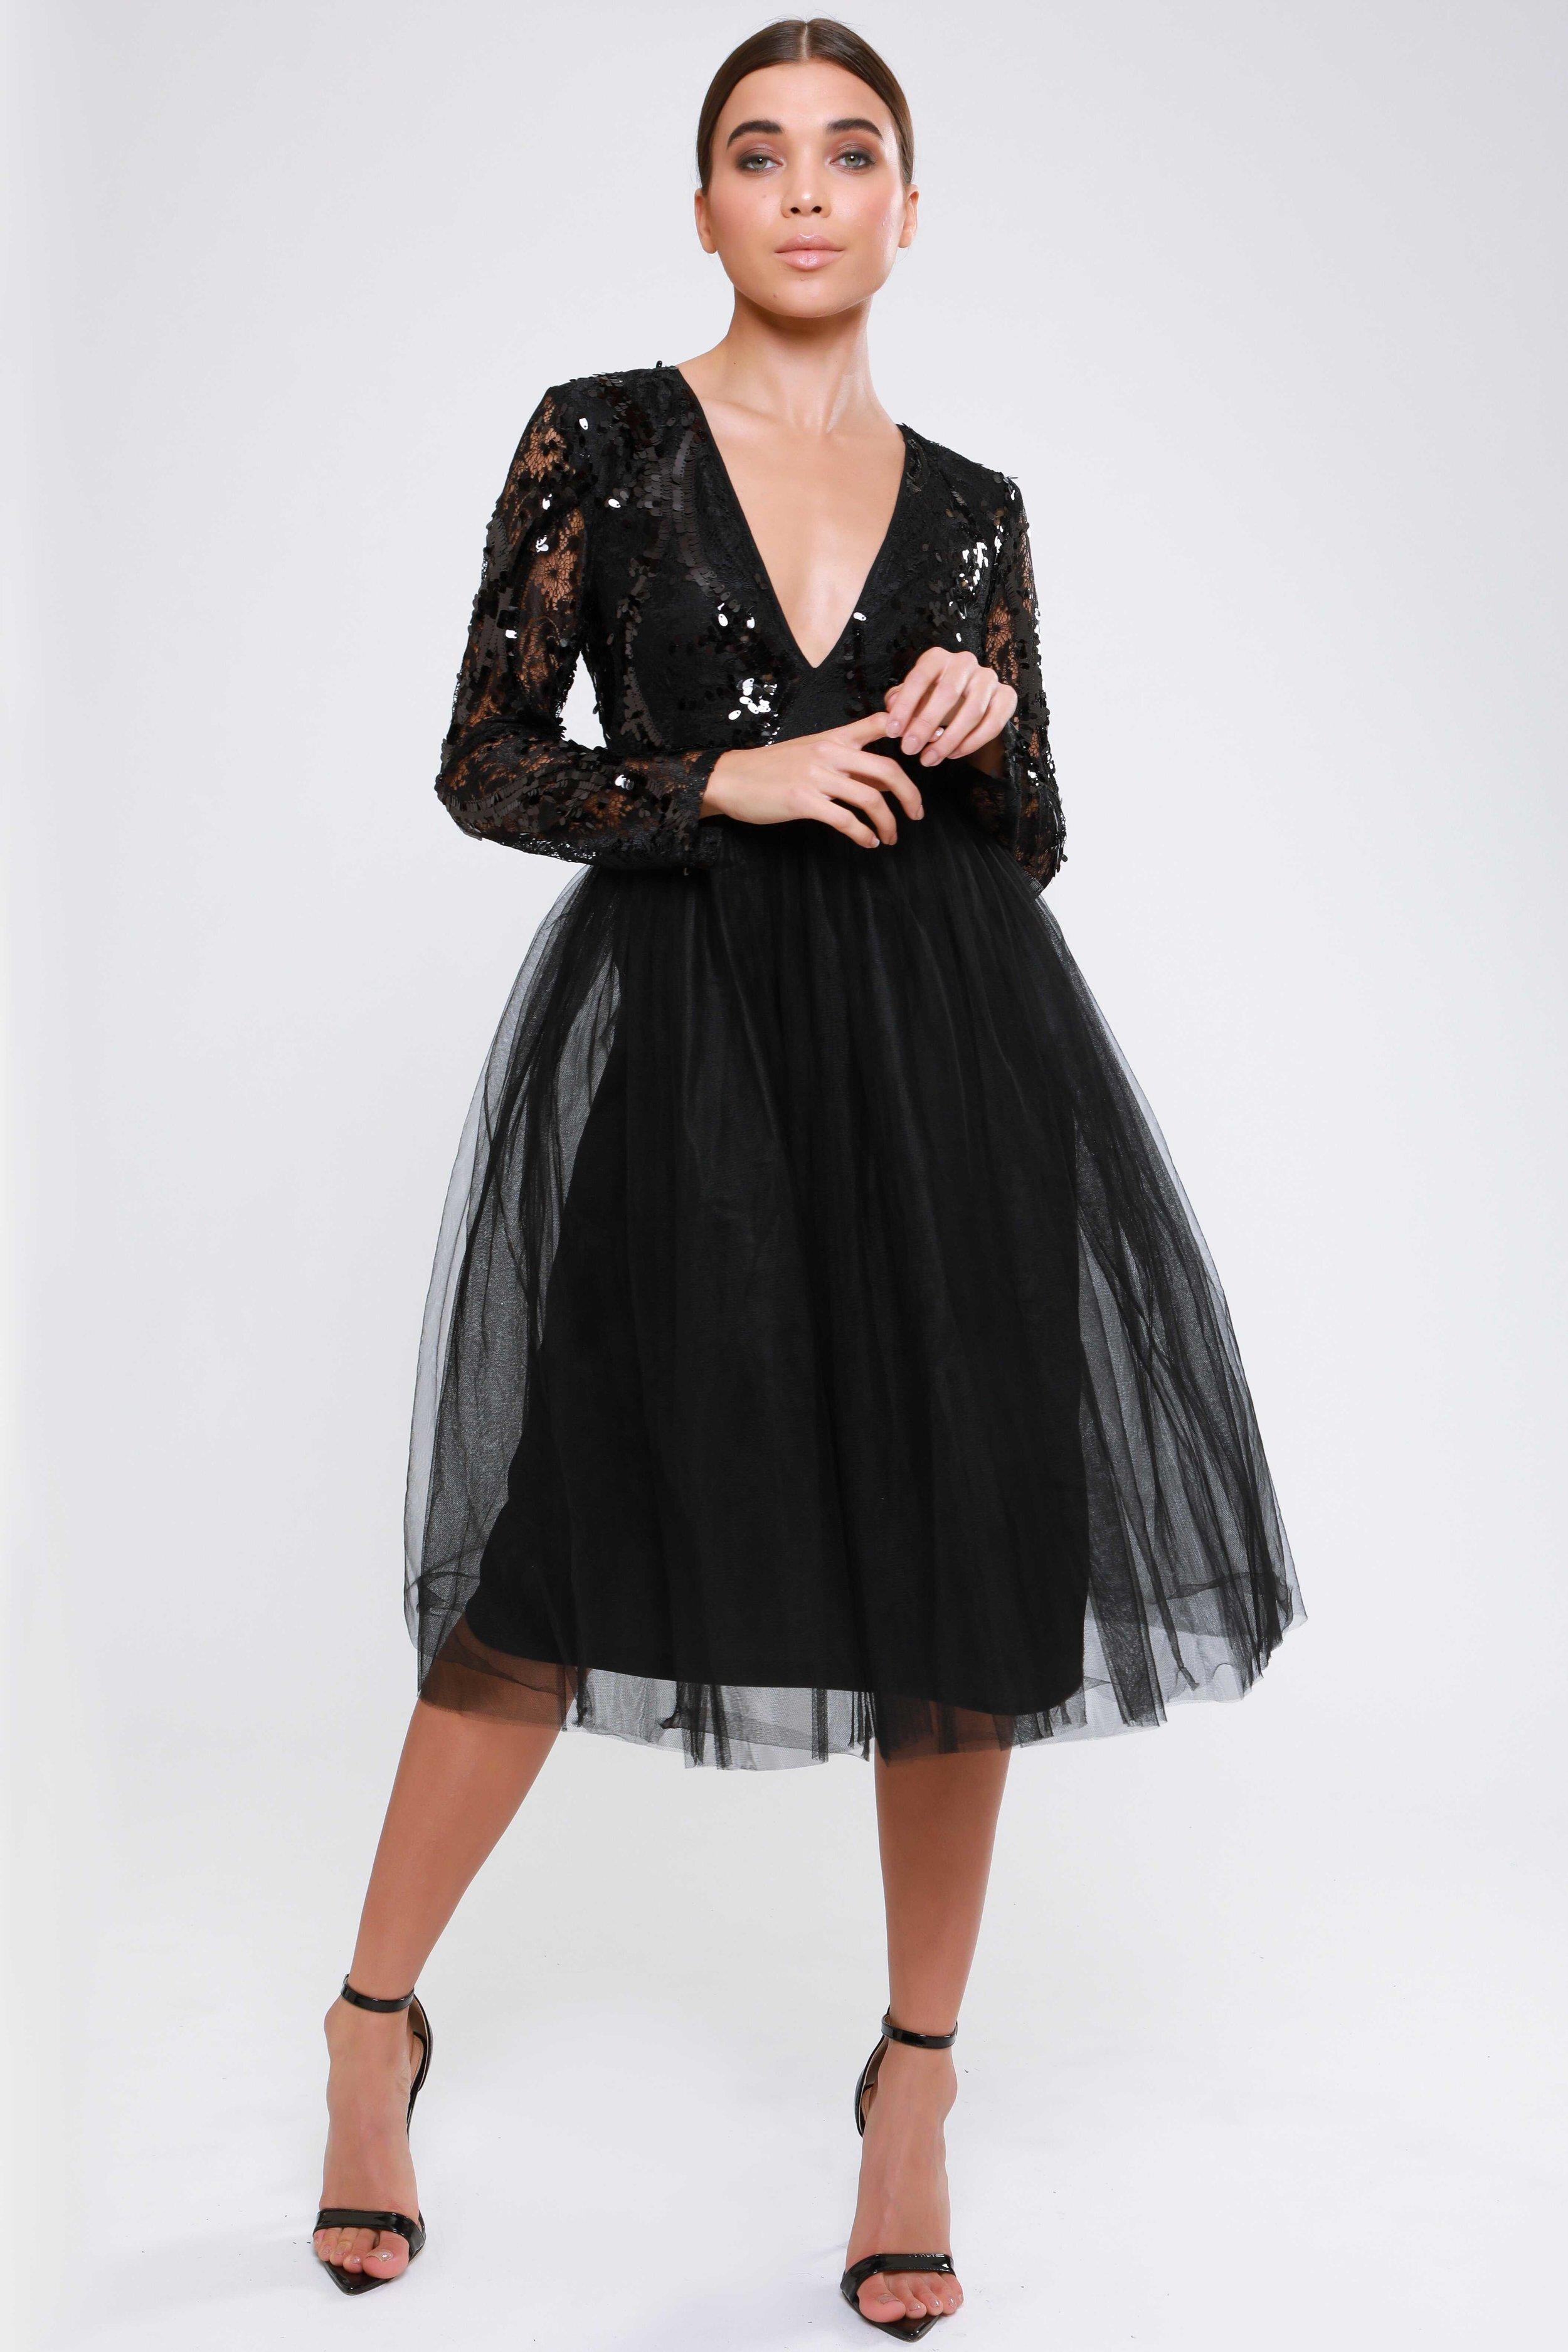 Plunge Sequin Lace  Tutu Dresses   £79.00